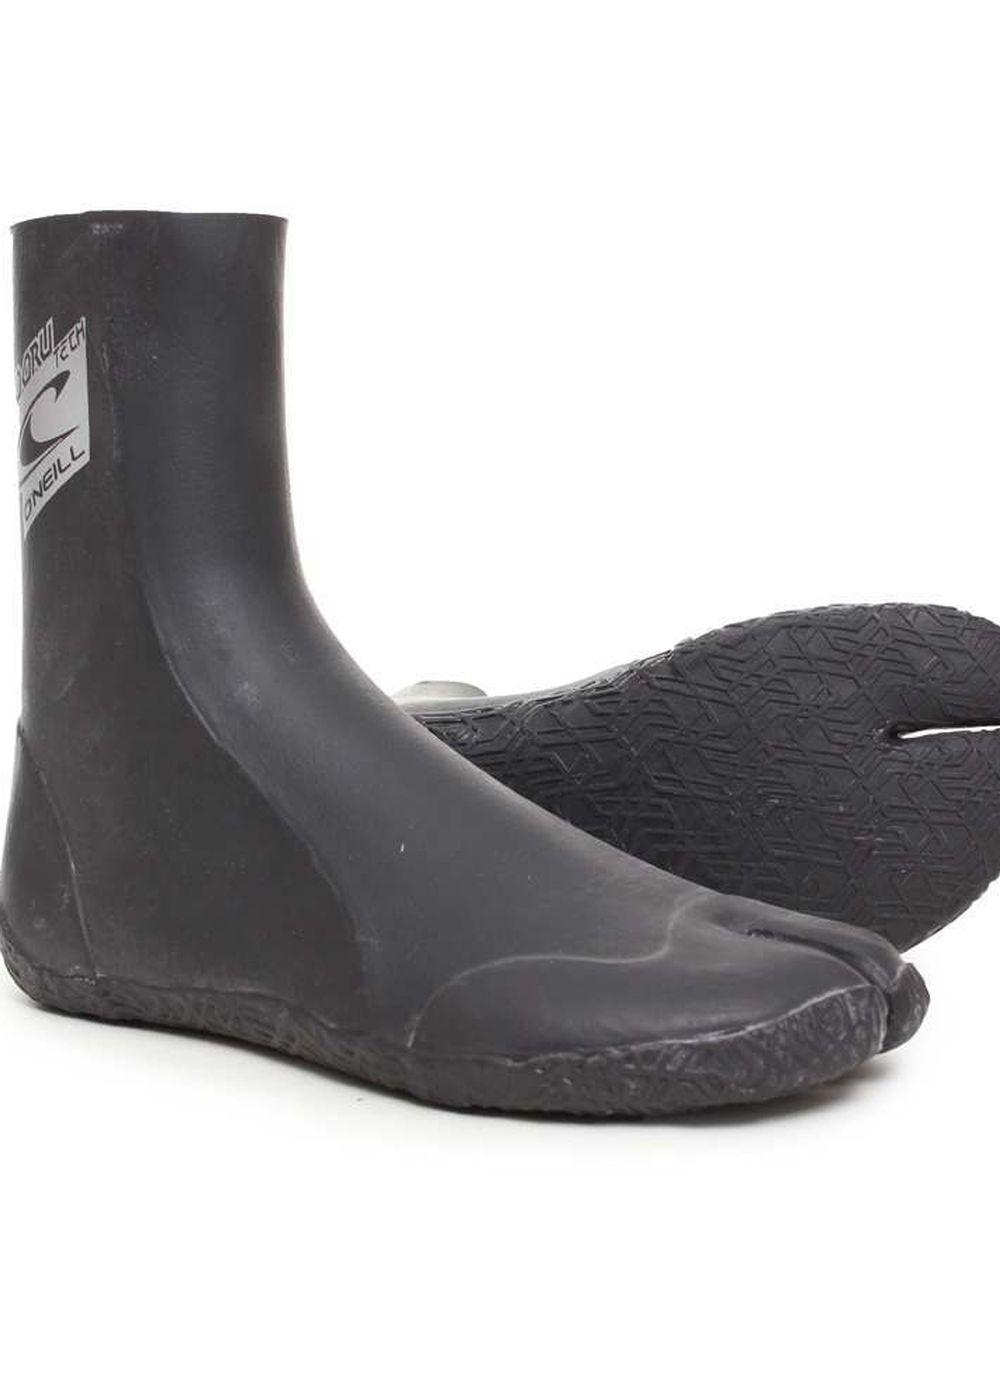 Oneill Gooru Tech 5mm St Wetsuit Boots Picture